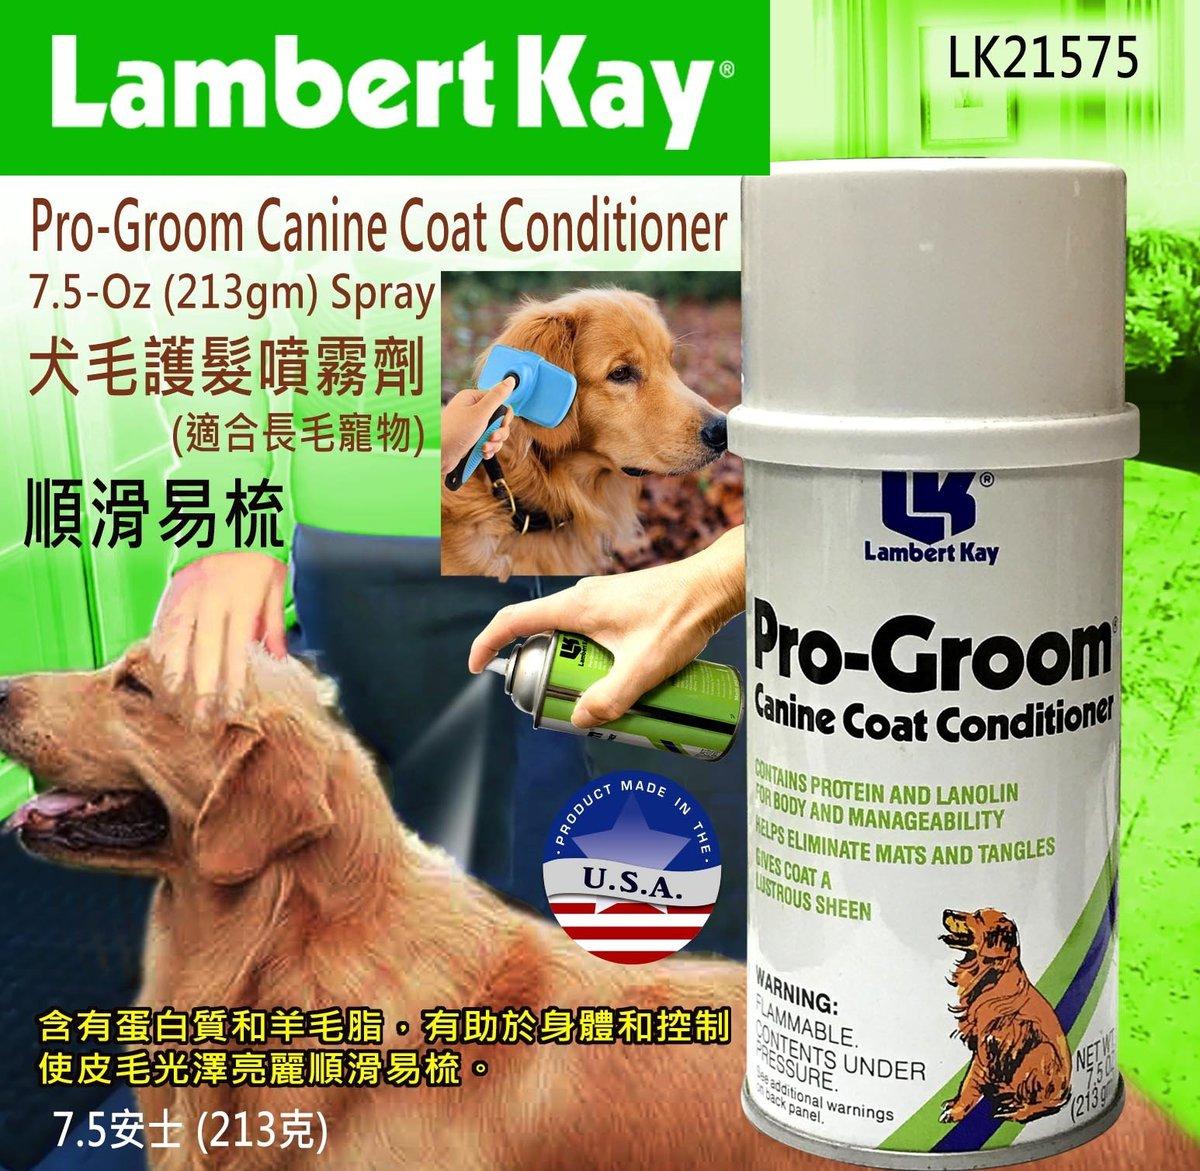 Pro-Groom Canine Coat Conditioner 7.5-Oz (213gm) Spray